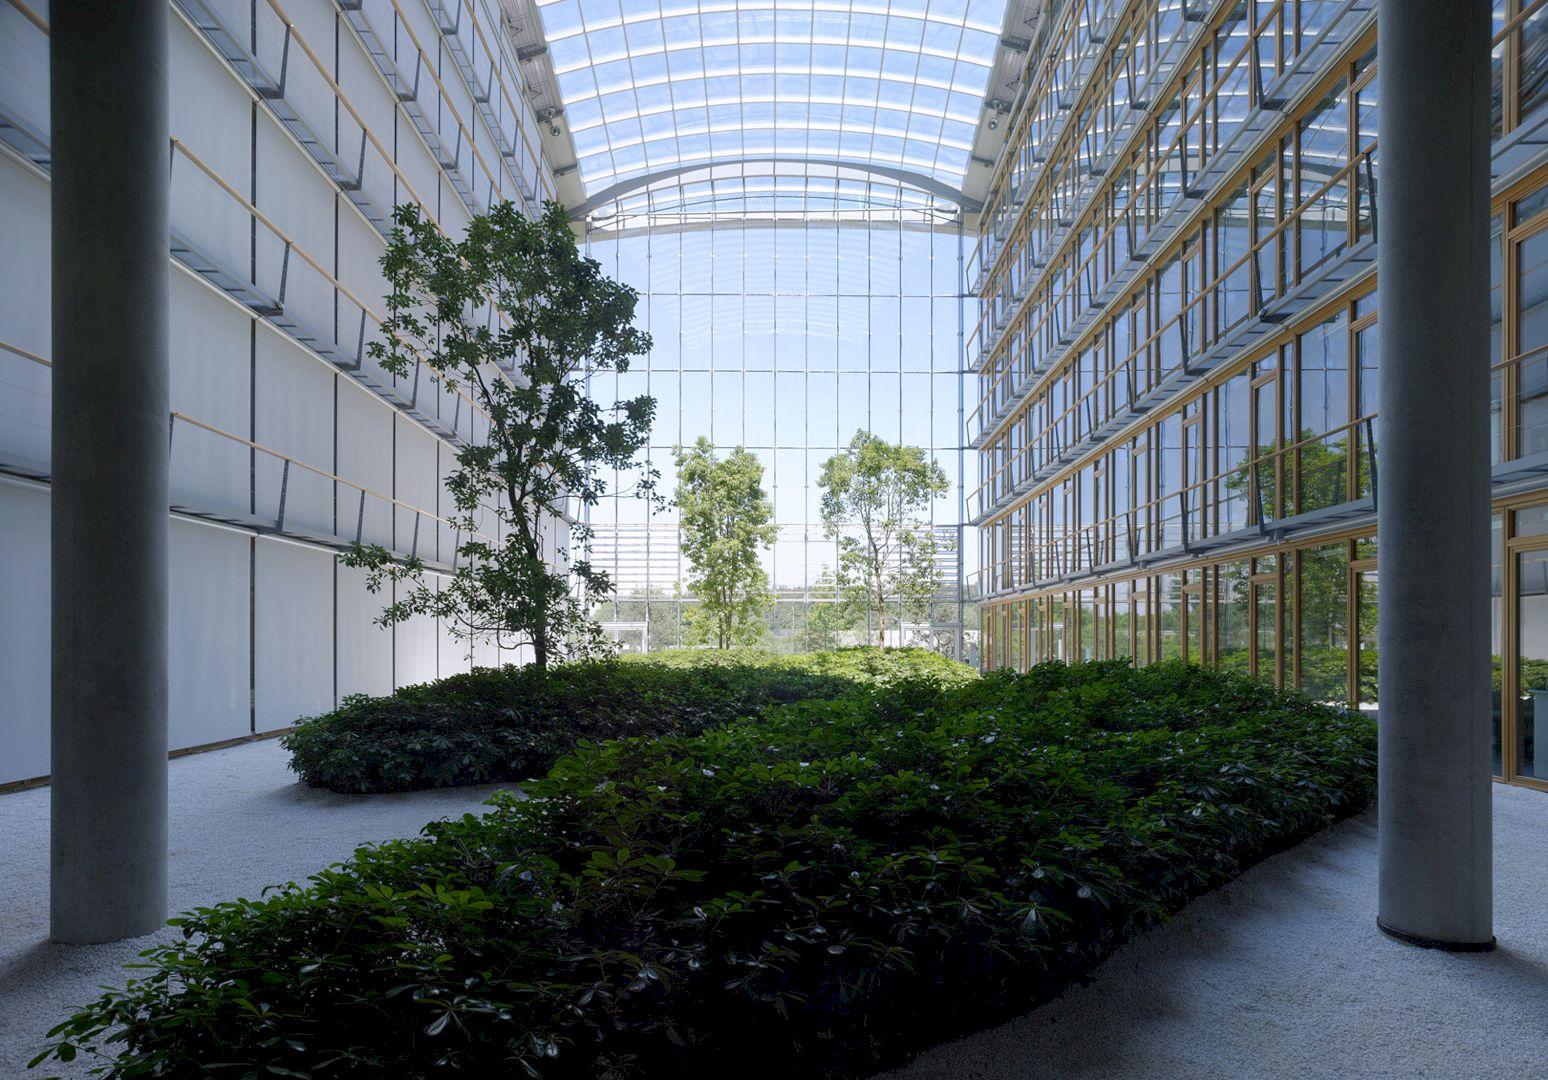 Lufthansa Aviation Center Frankfurt By Ingenhoven Architects 3